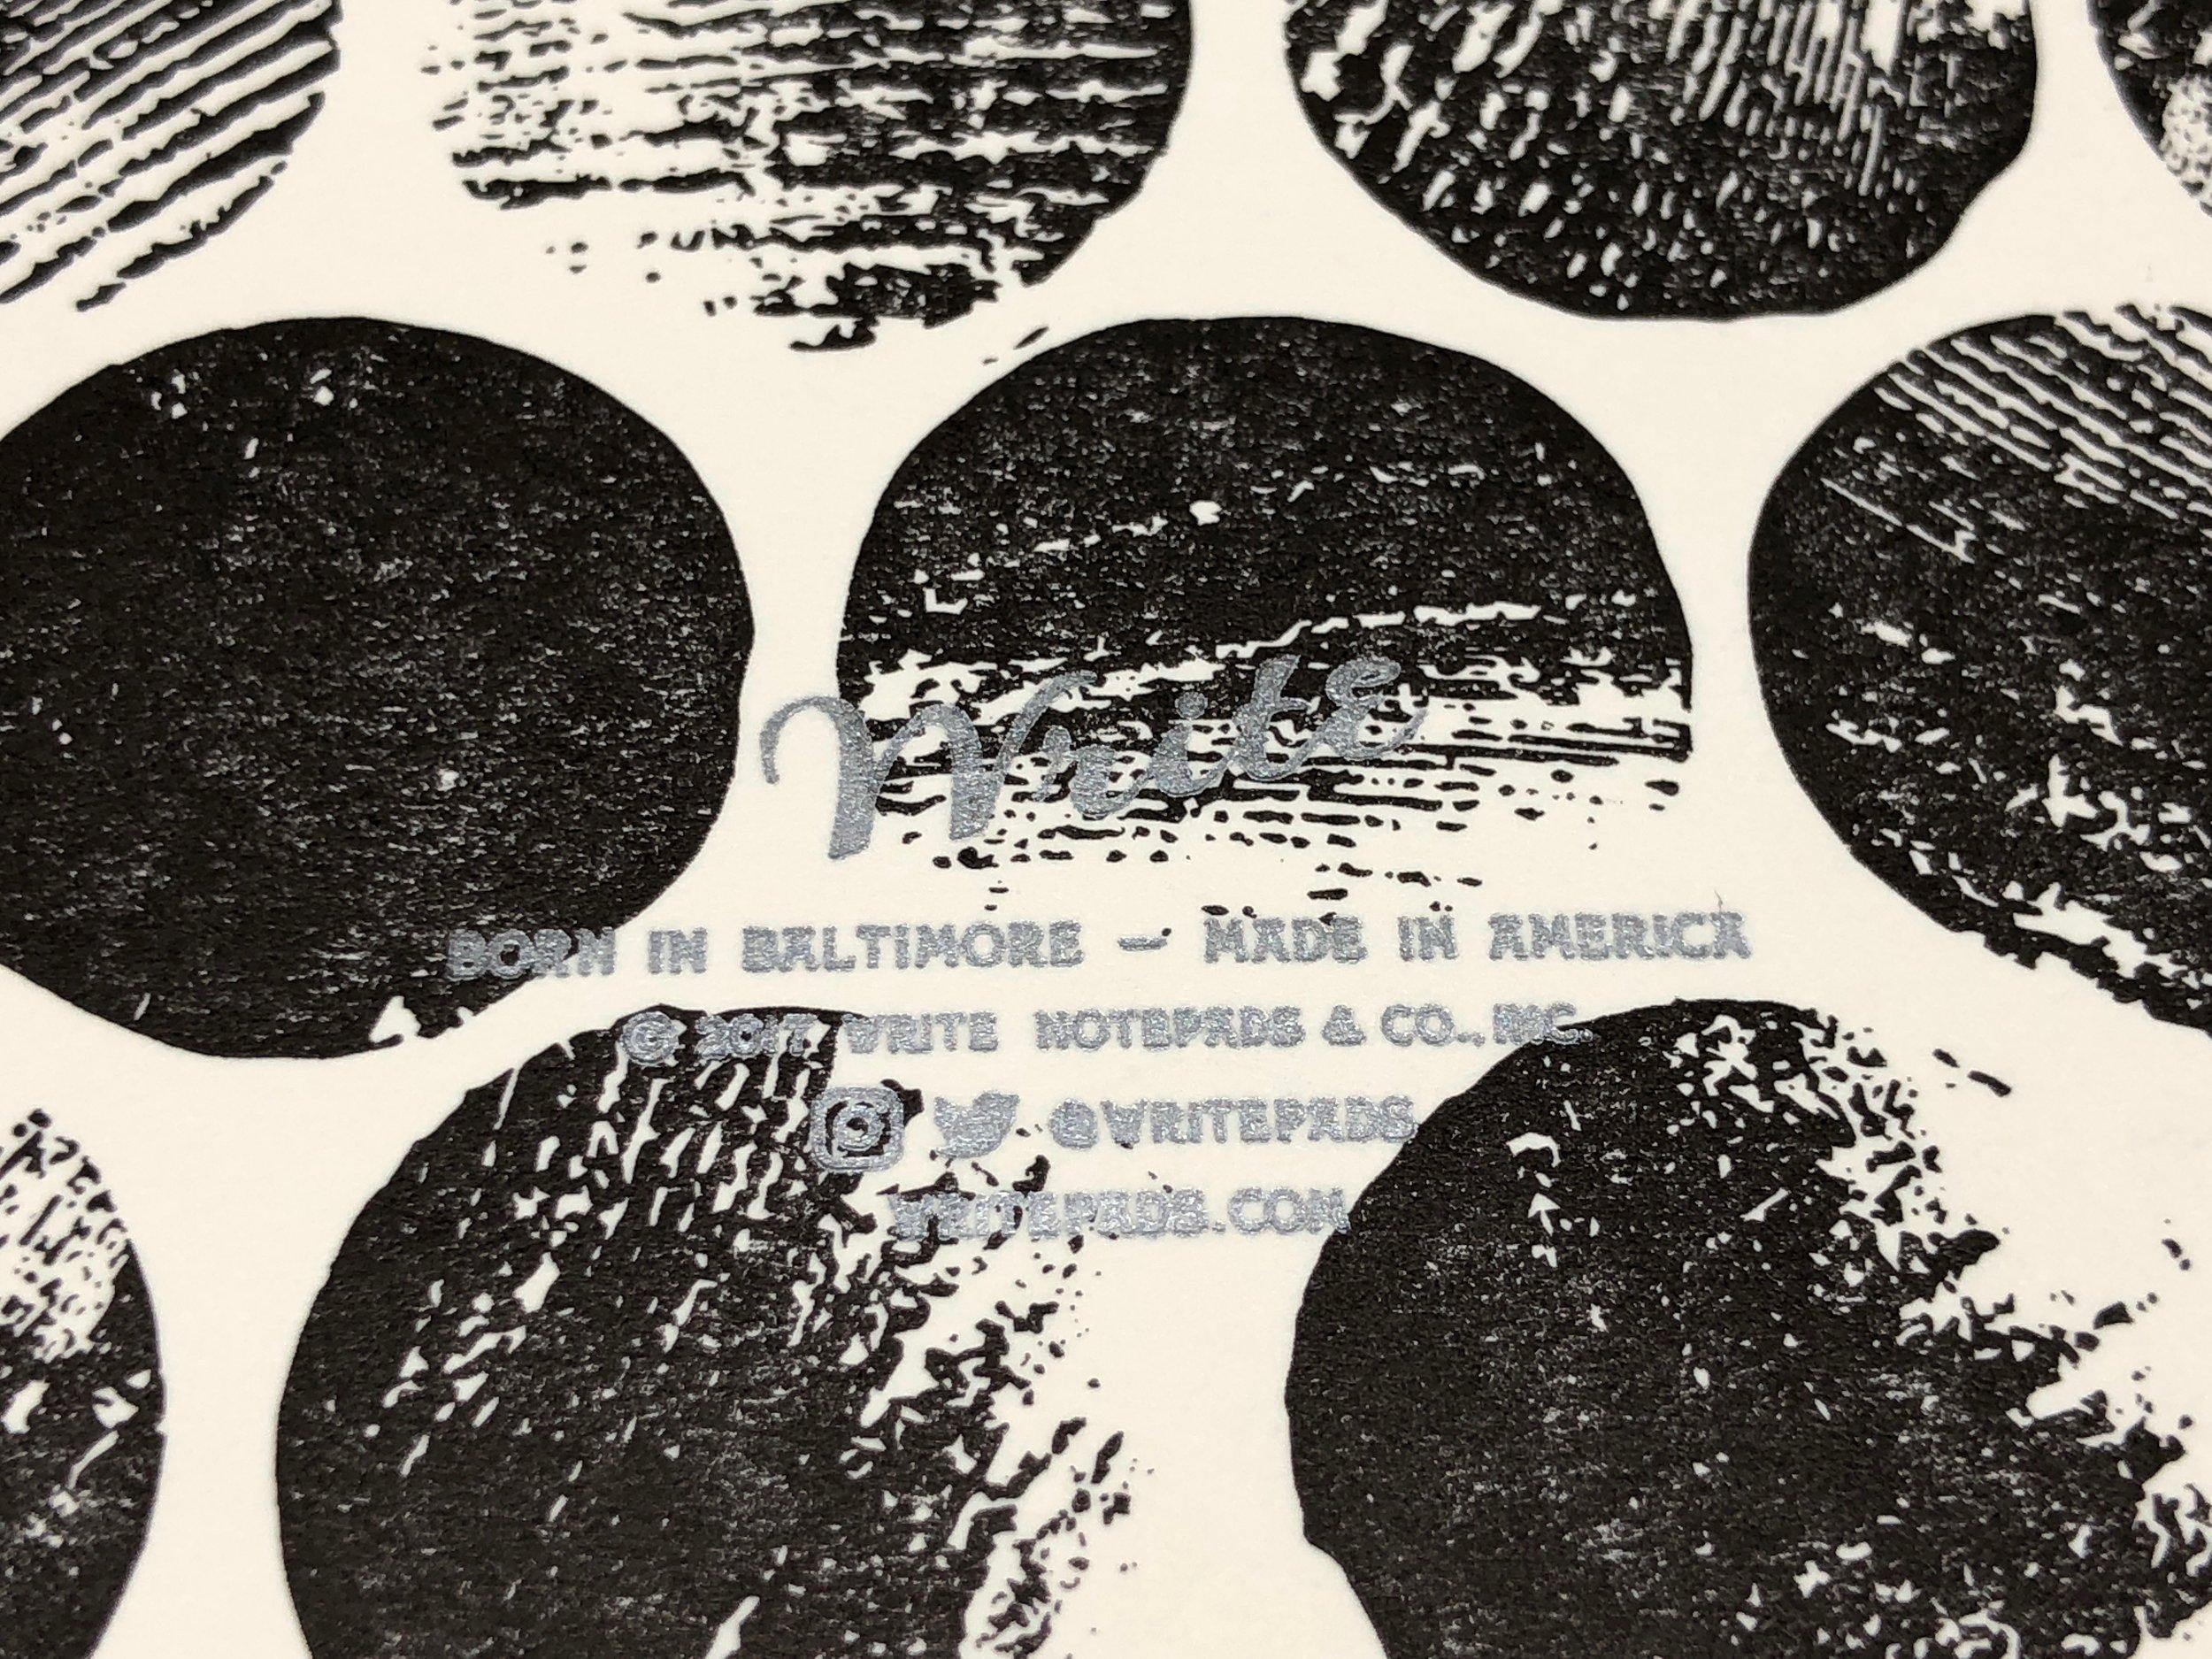 write-notepads-fingerprint-8.jpg